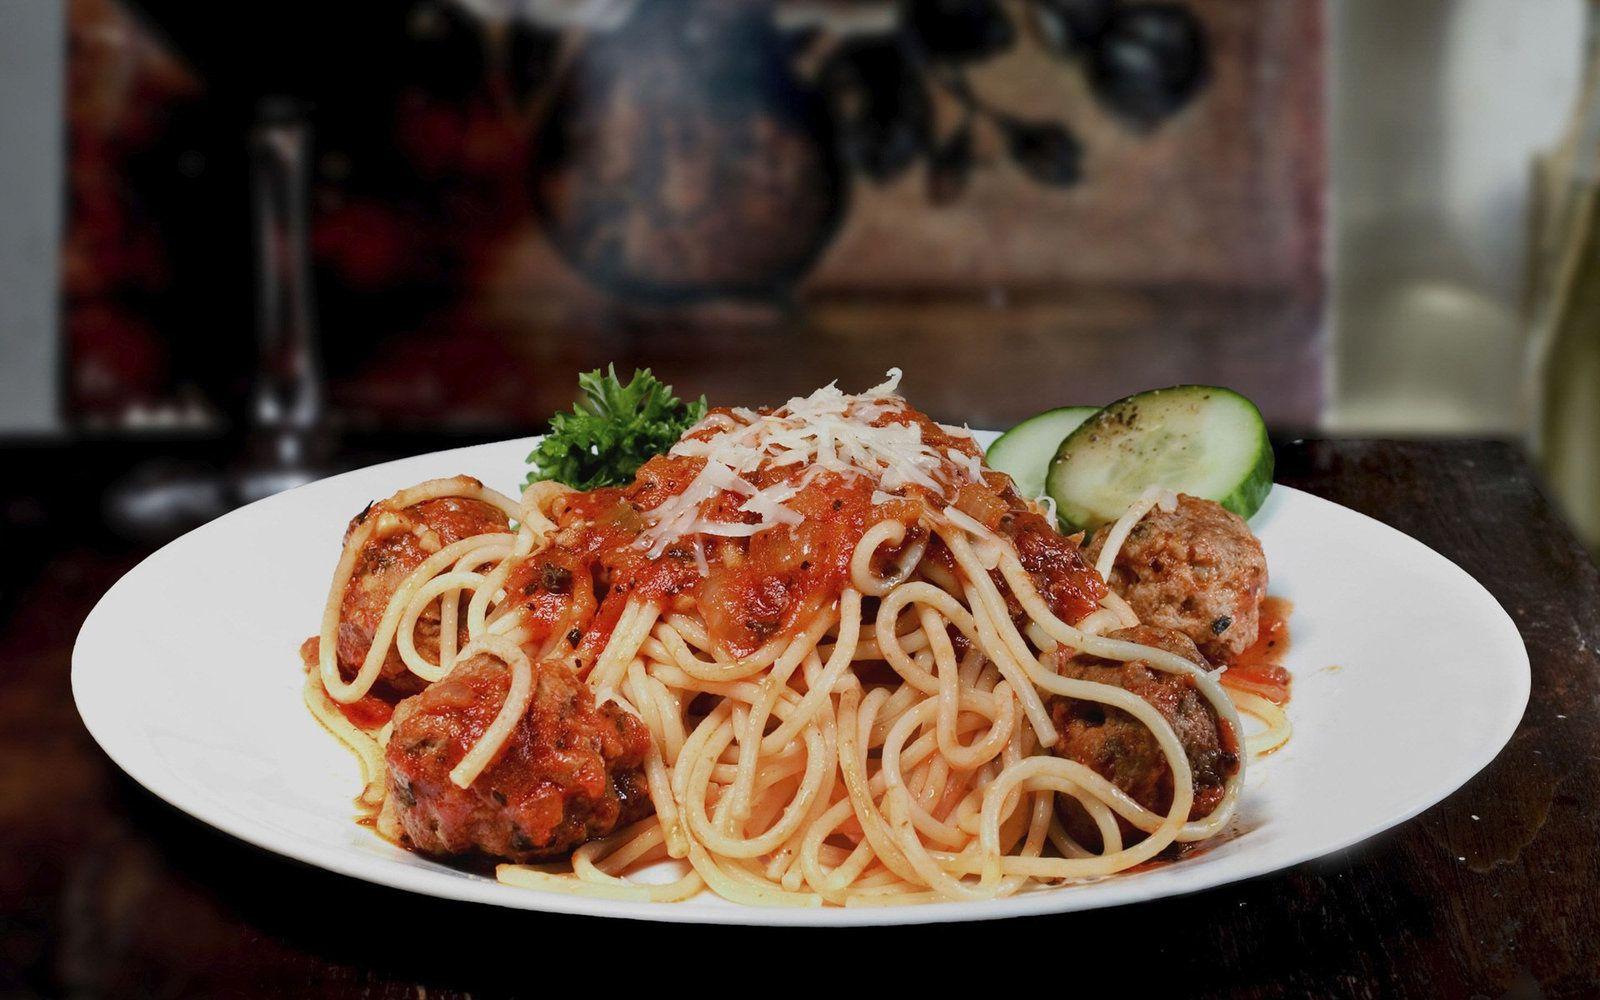 Bon appétit - Spaghettis - Boulettes - Viande - Wallpaper - Free